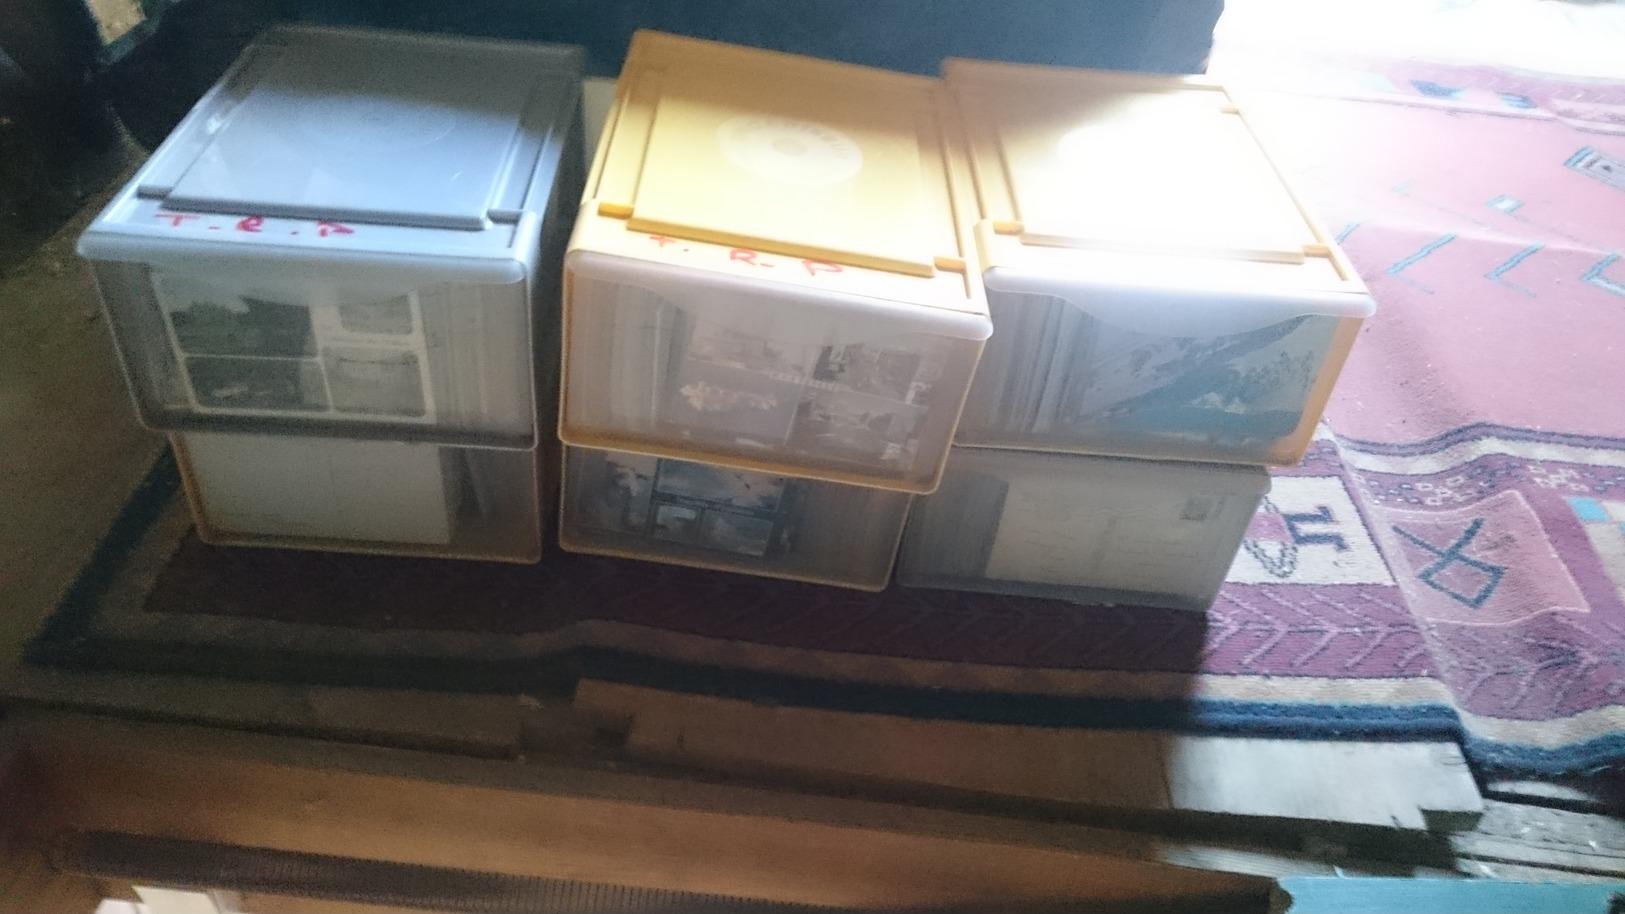 Lot 8000 Cartes Postales - Postcards